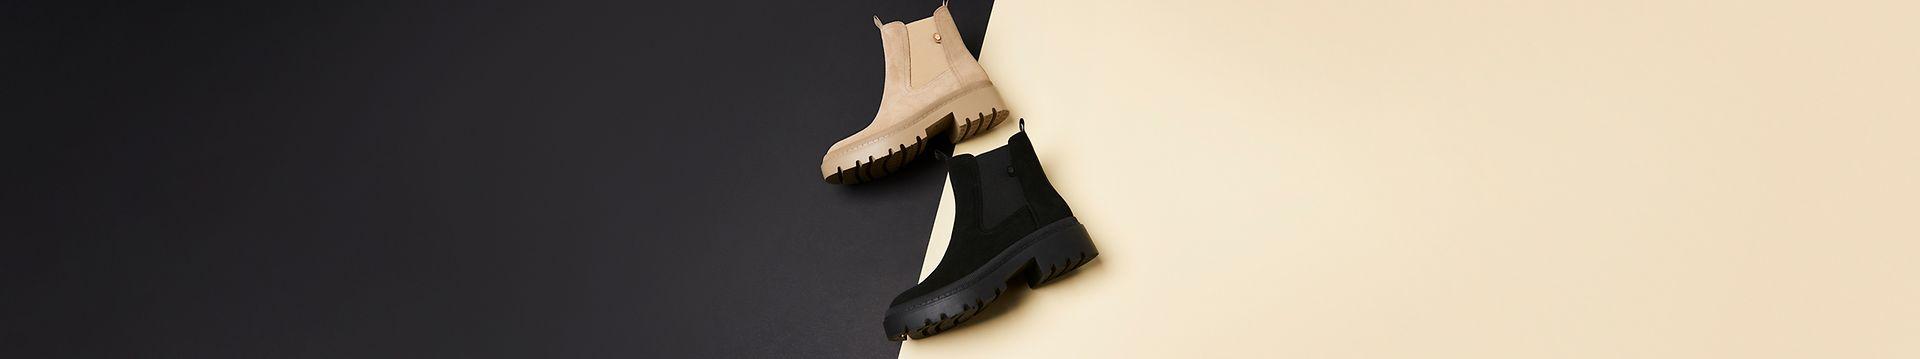 352021 - women - shoes - tc banner - shoes - IMG